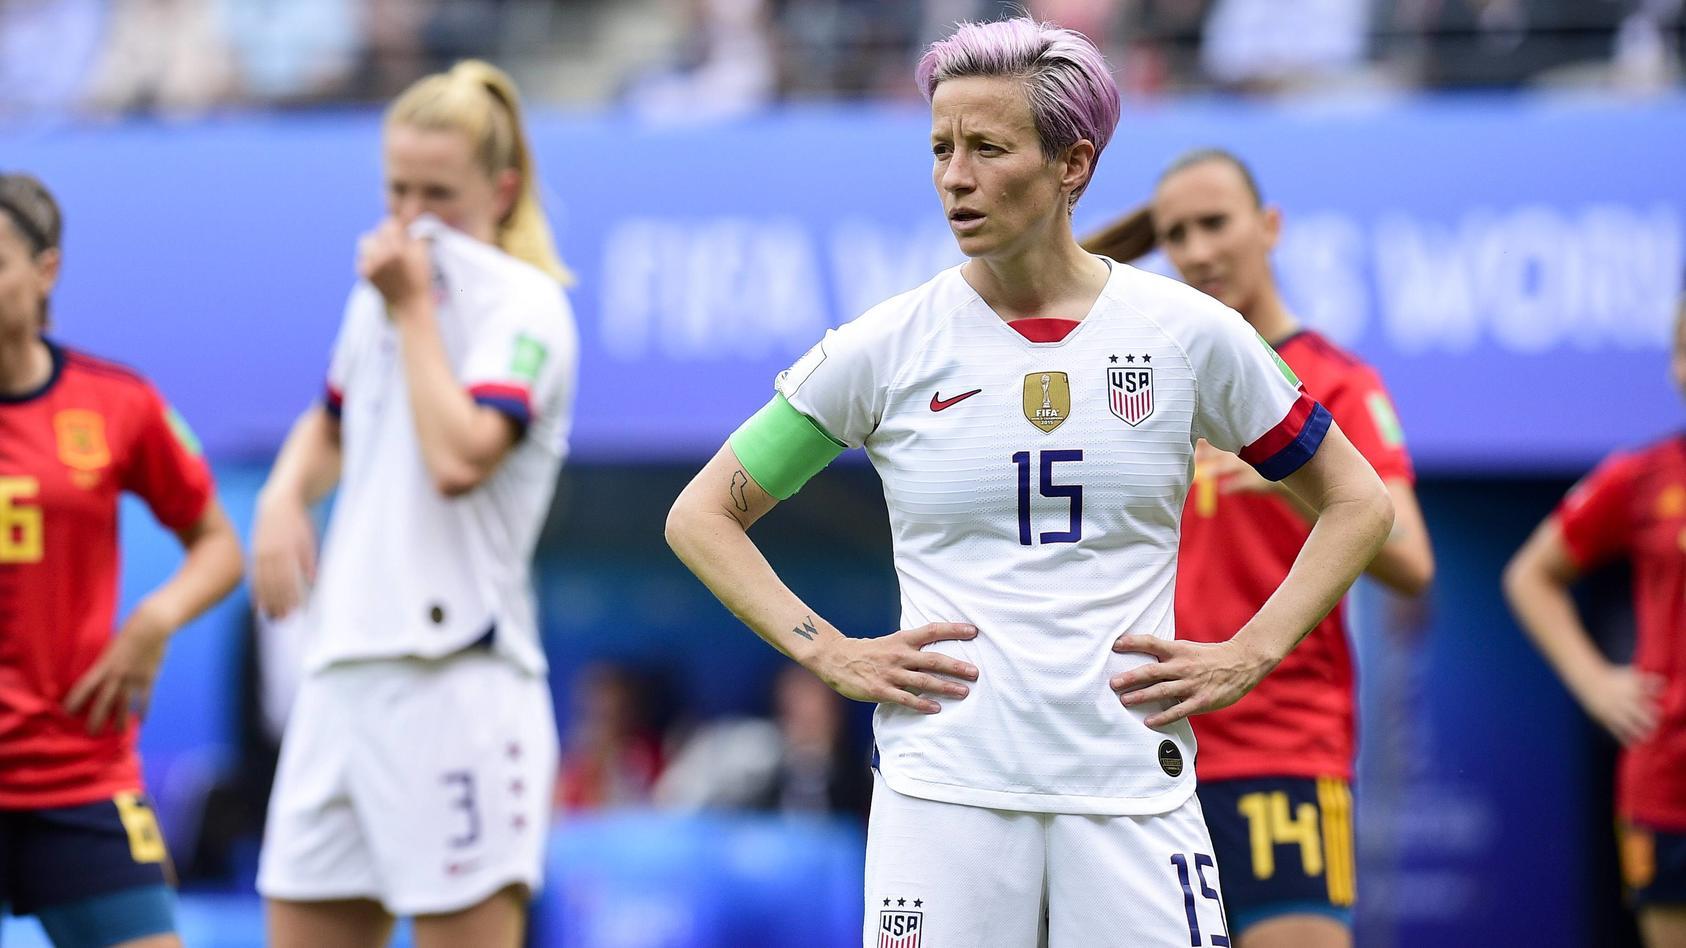 Megan RAPINOE USA FOOTBALL Espagne vs Etats Unis Coupe du Monde Feminine Reims 24 06 2019